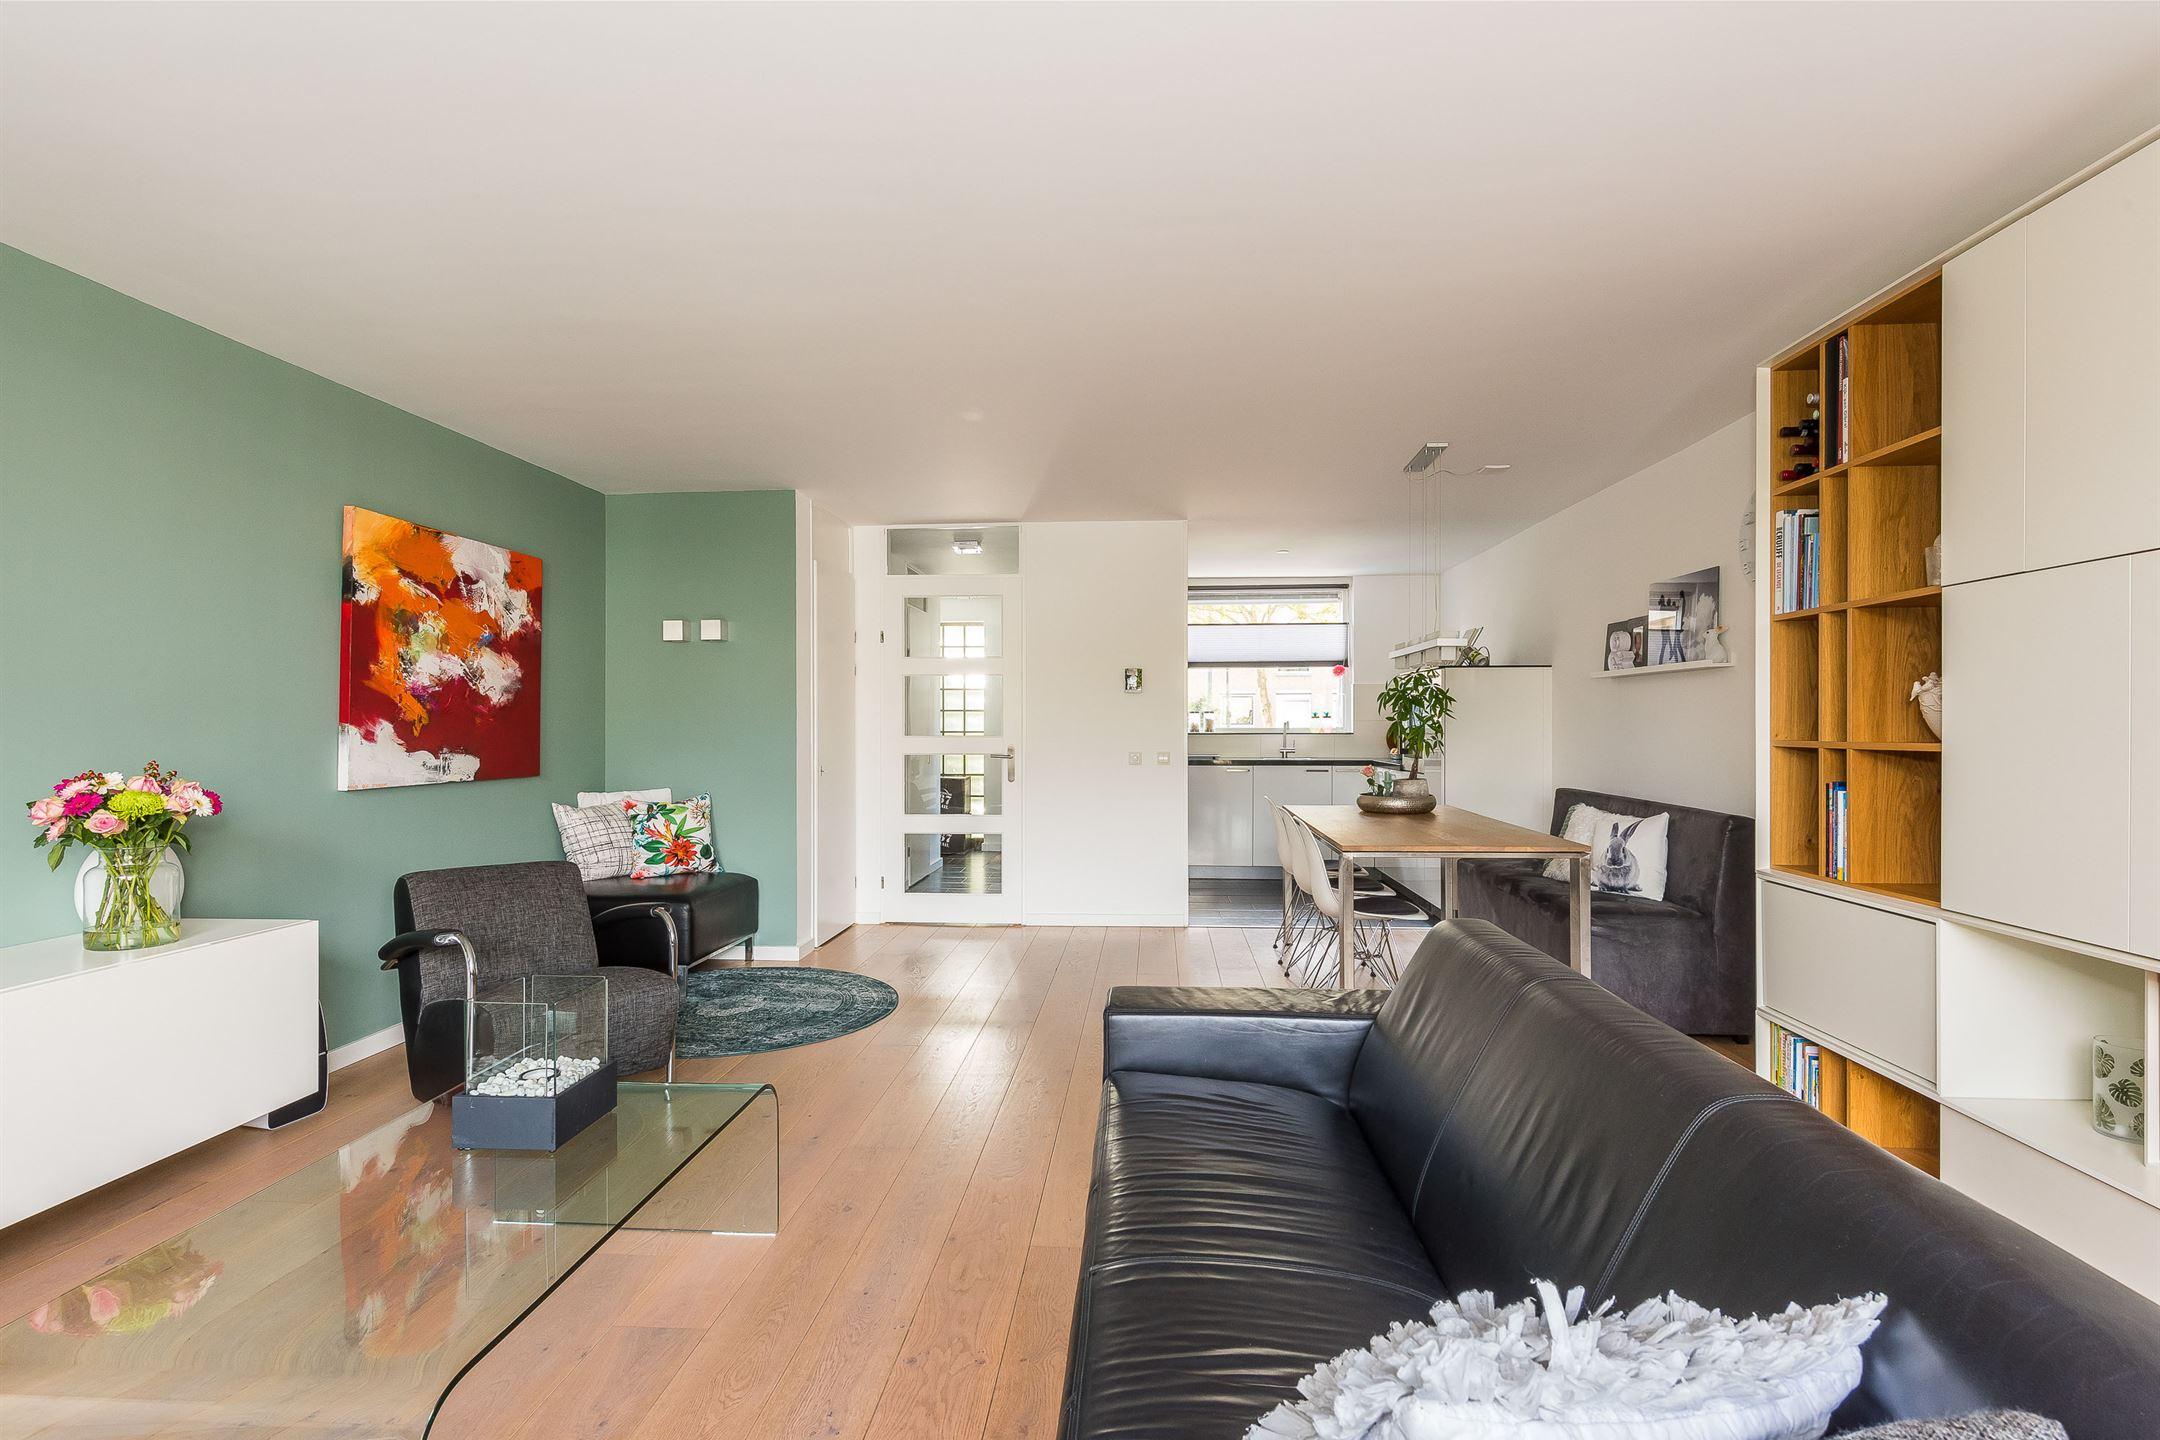 Huis te koop: gustav stresemannring 37 3137 dk vlaardingen [funda]